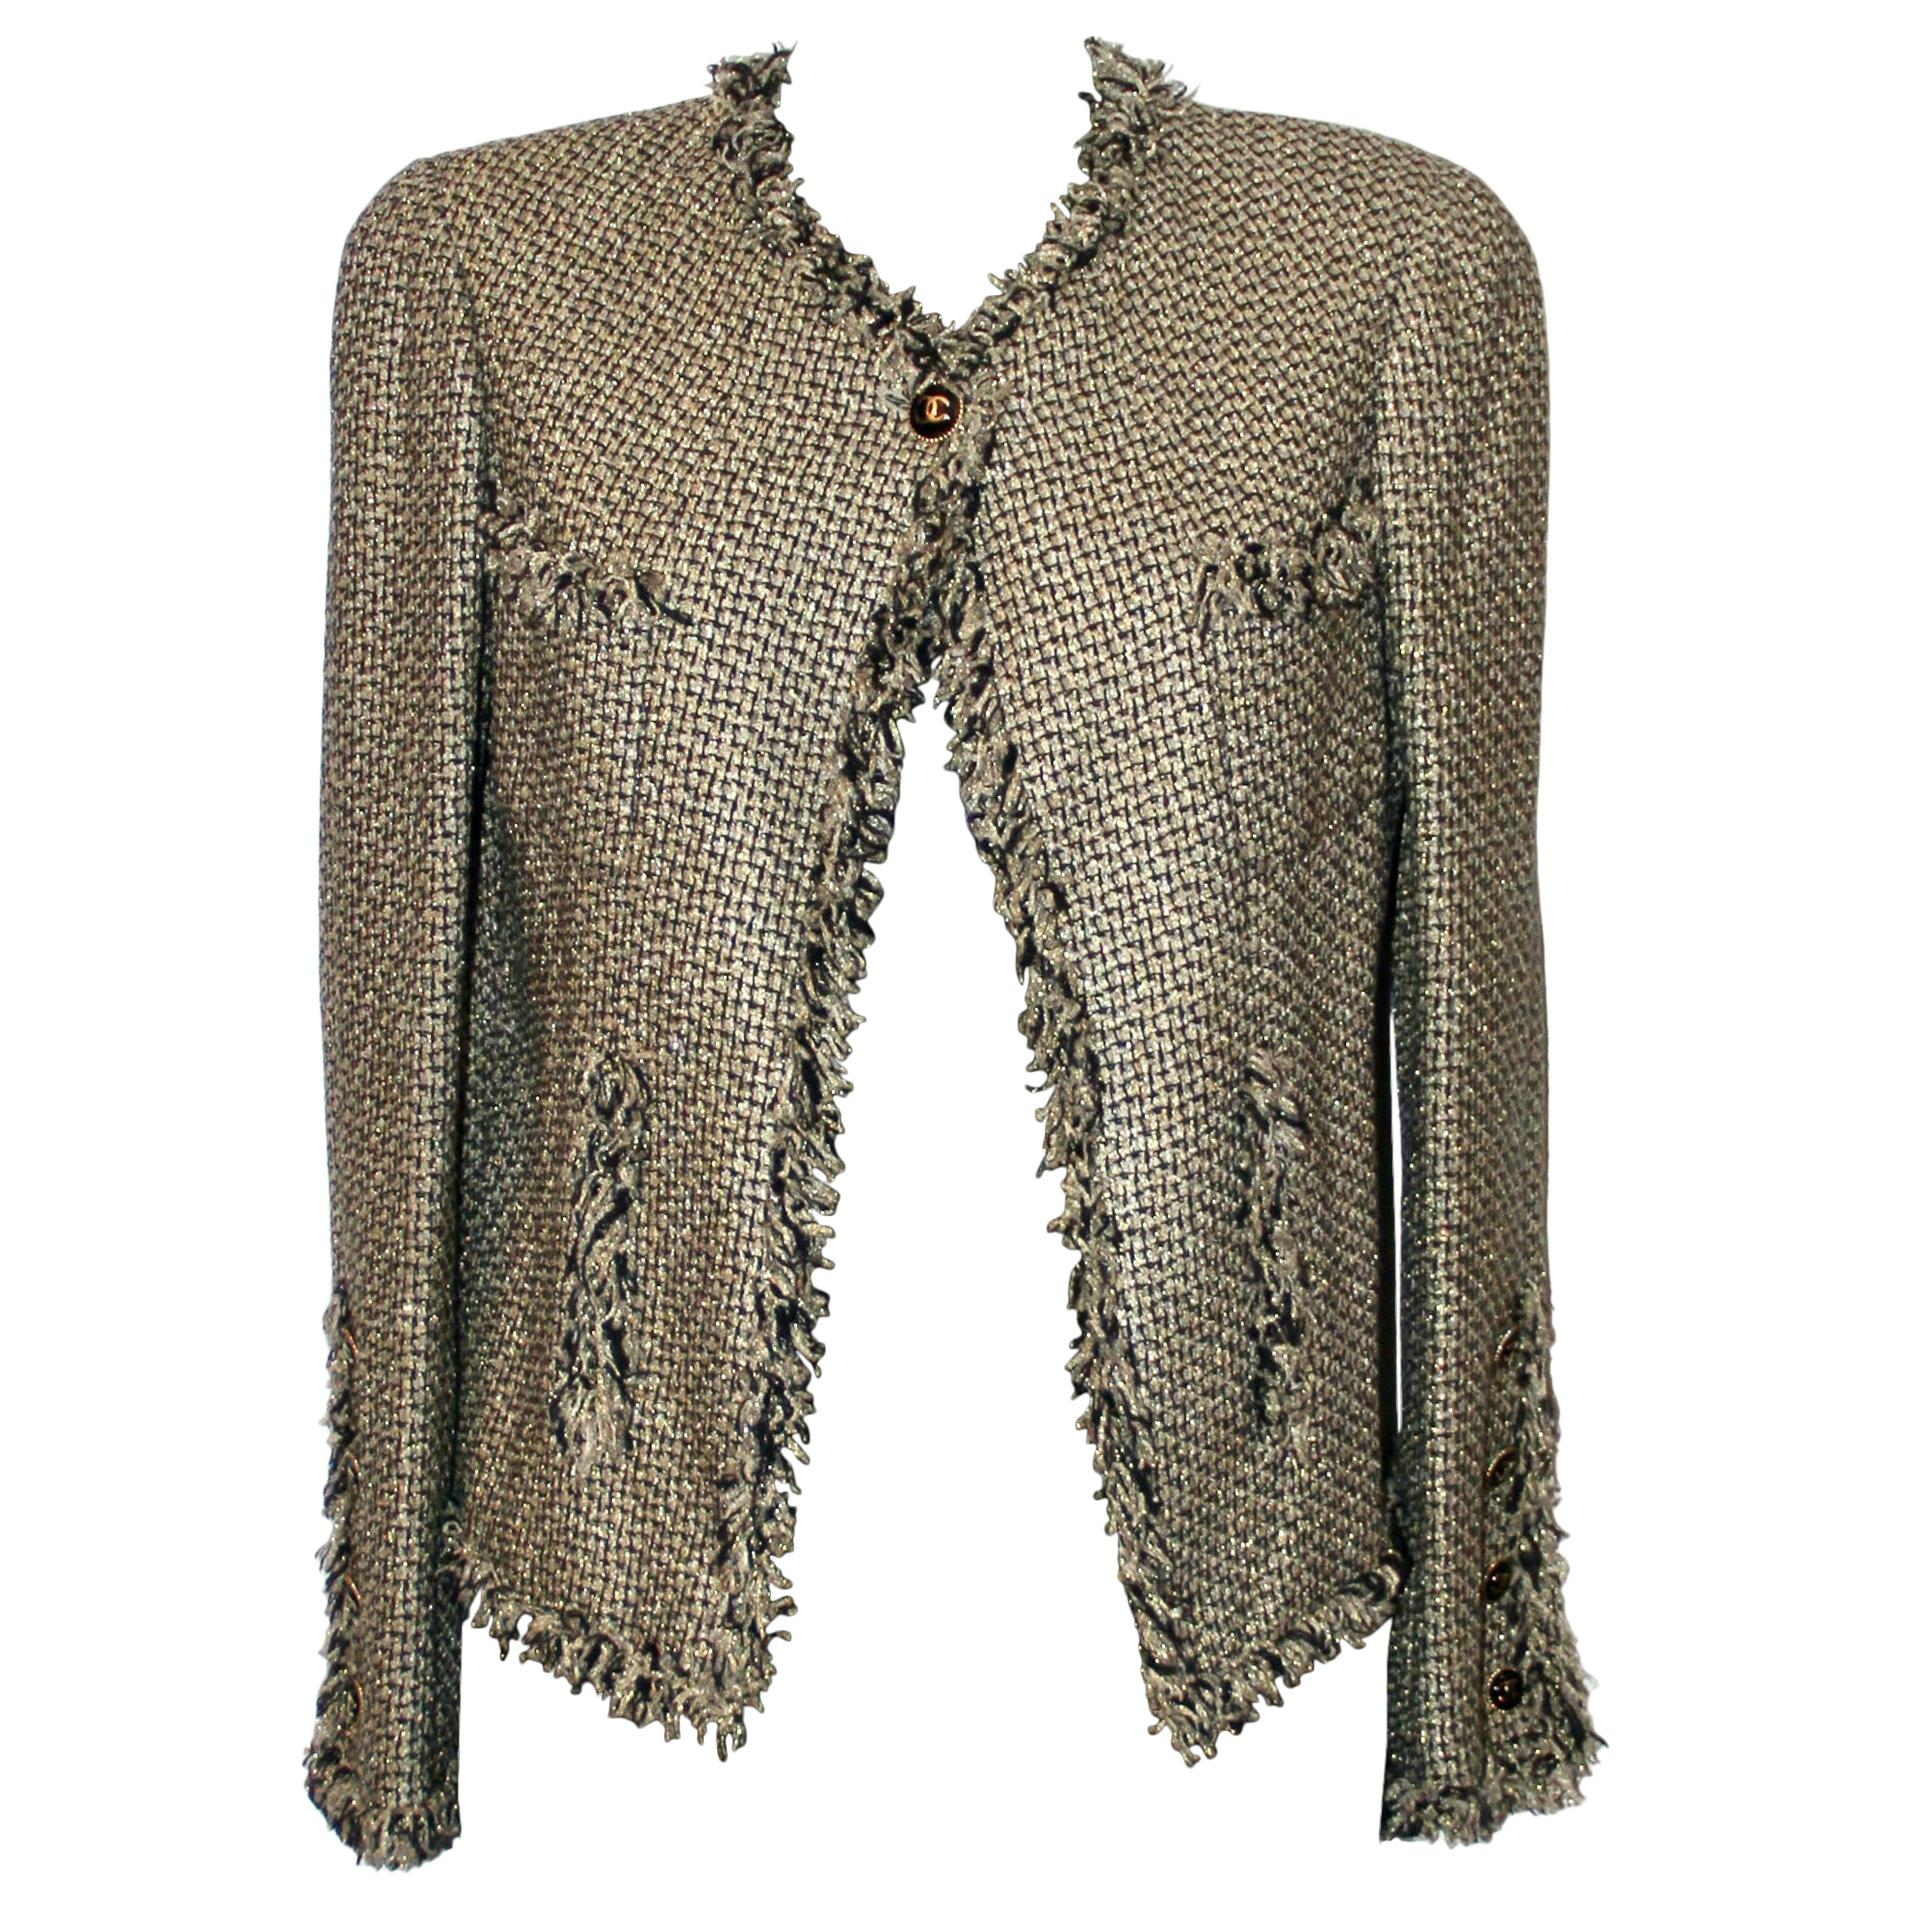 Chanel Spring 2007 Gold Lurex Beige and Black Tweed Jacket